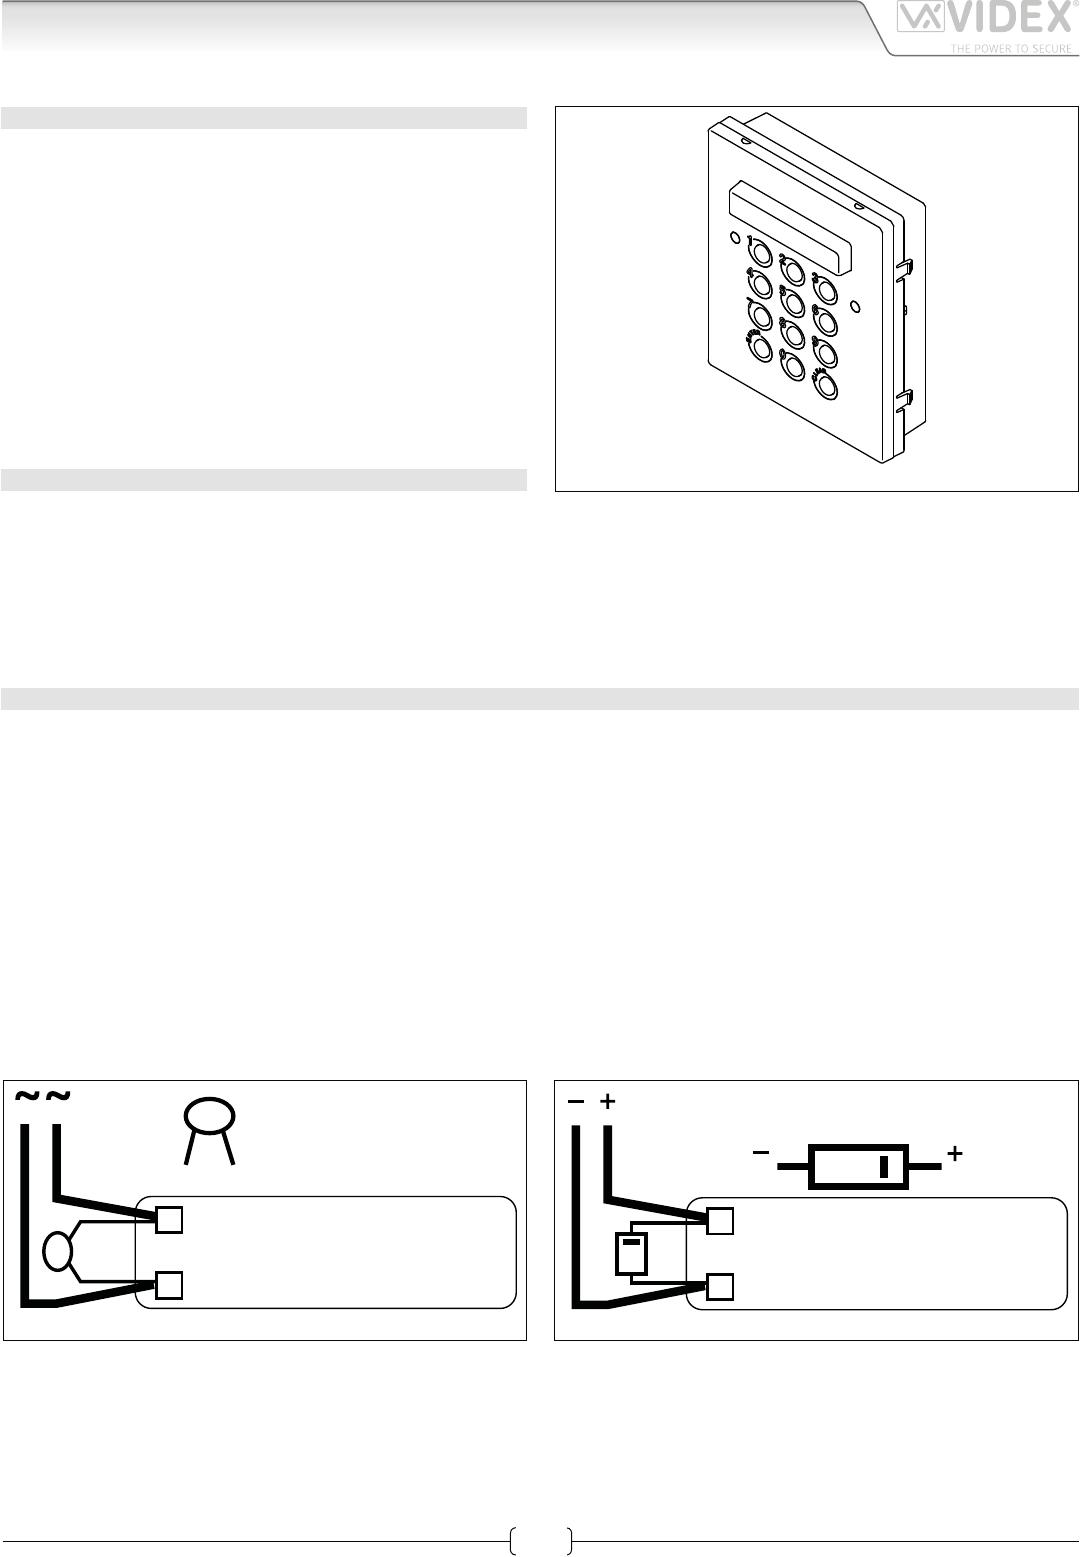 Videx Smart 1 Wiring Diagram Explained Diagrams Vk4k Installation Manual Whirlpool Refrigerator